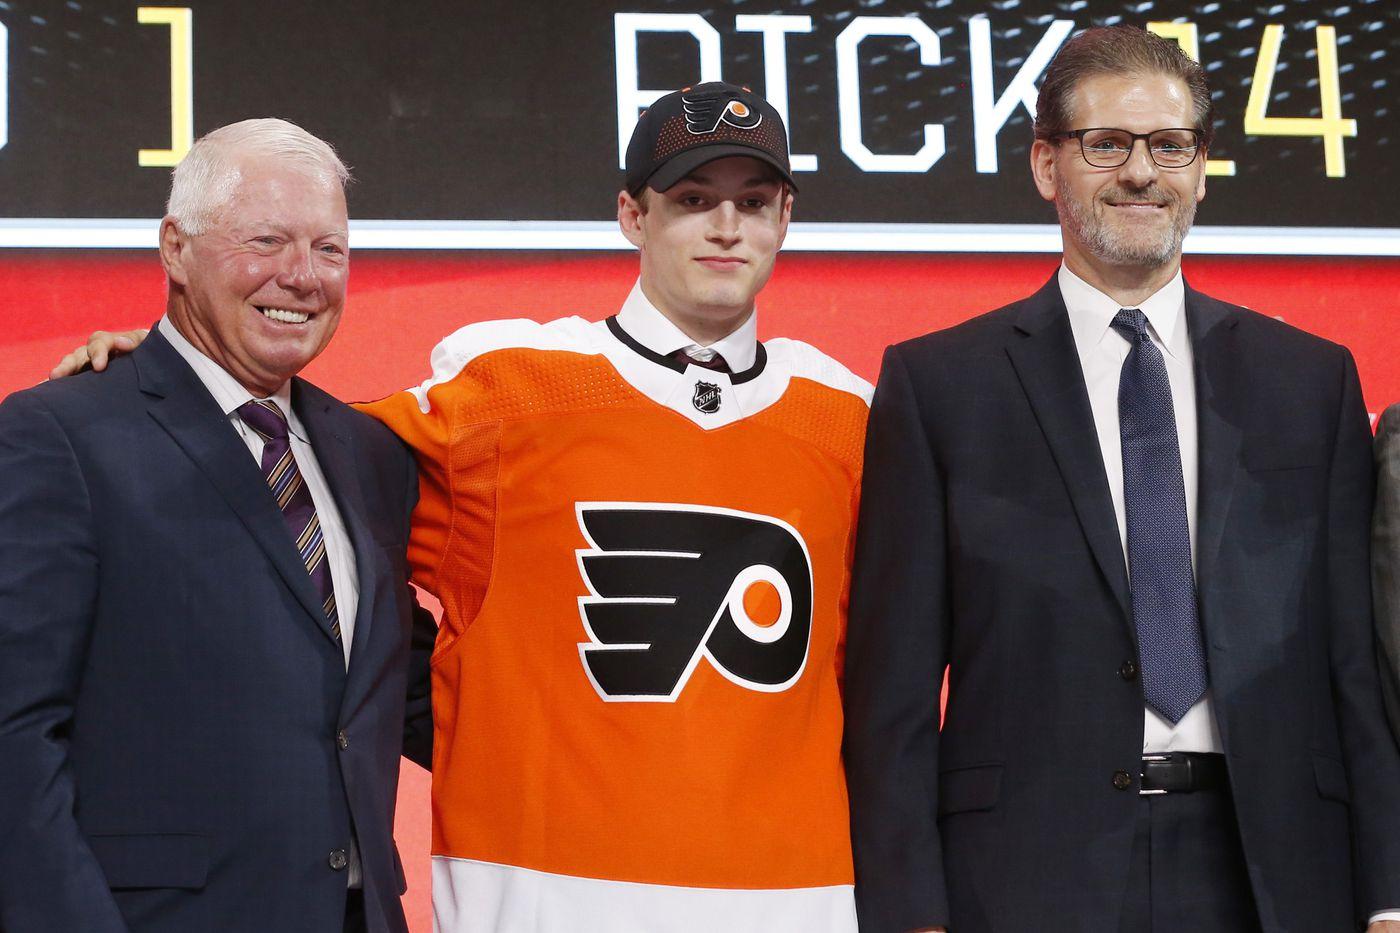 Flyers draft forwards Joel Farabee, Jay O'Brien with first-round picks